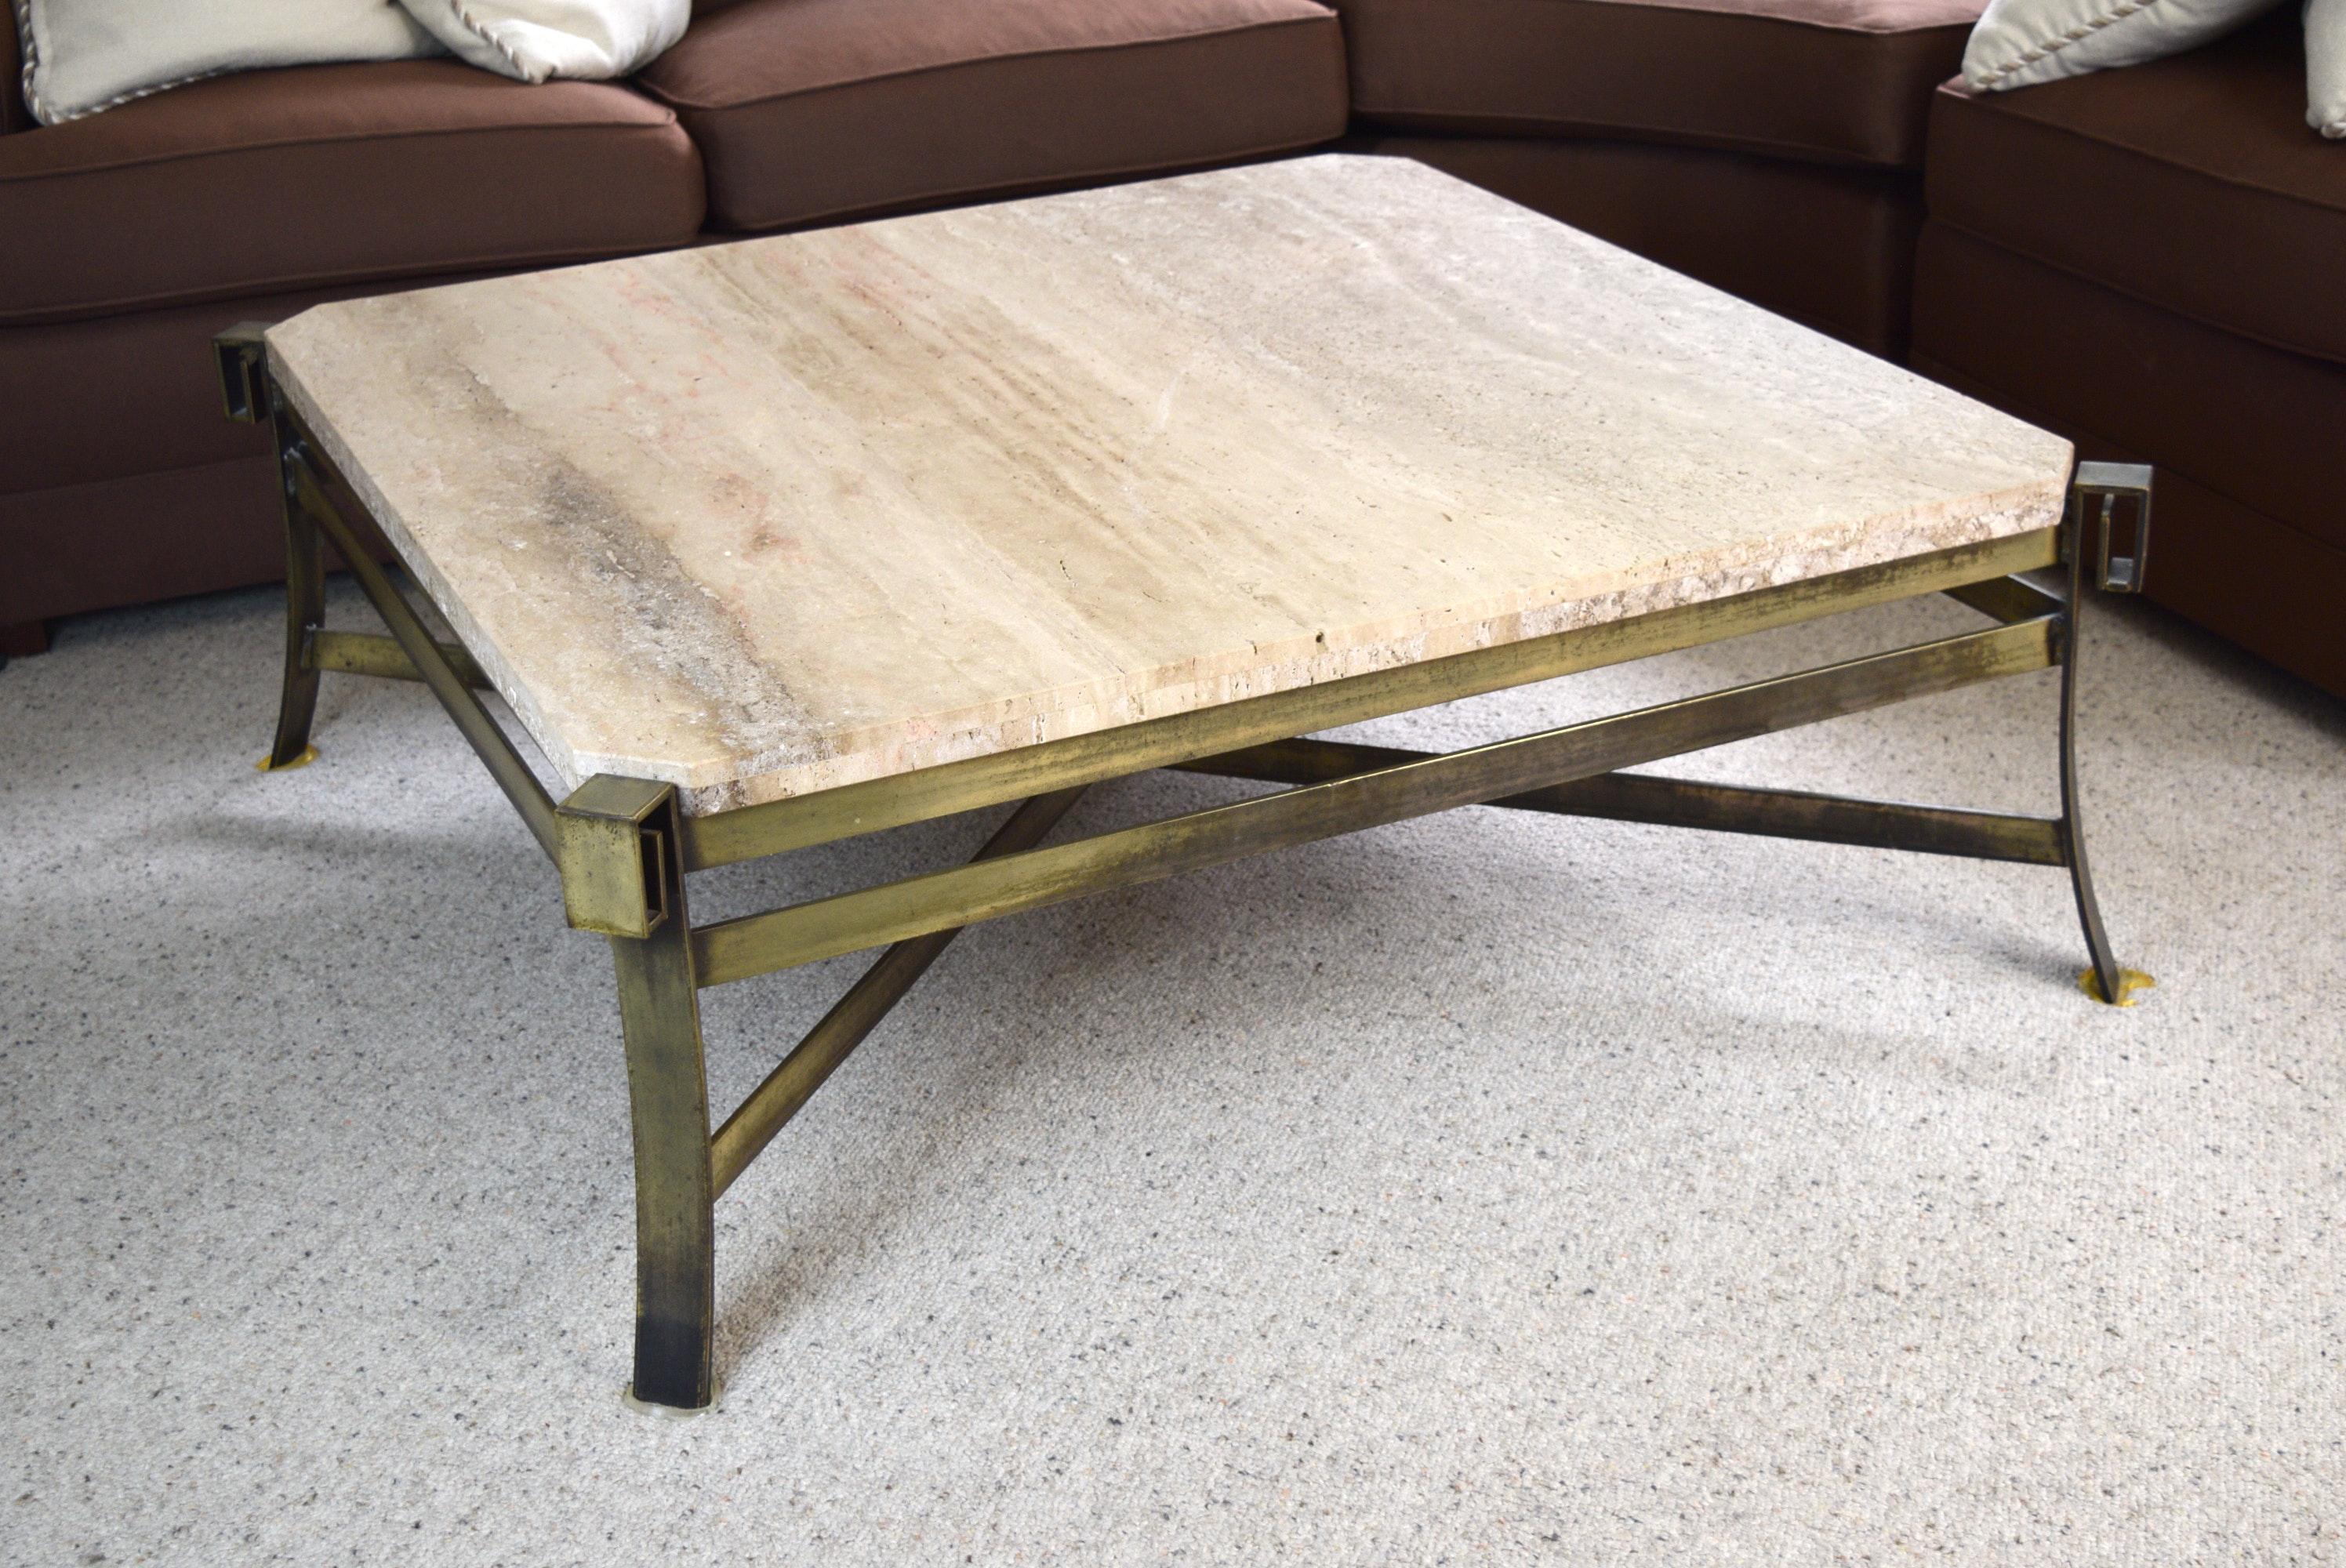 100 Travertine Coffee Table Kreiss Caravelle  : DSC0396JPGixlibrb 11 from 45.77.108.62 size 880 x 906 jpeg 187kB